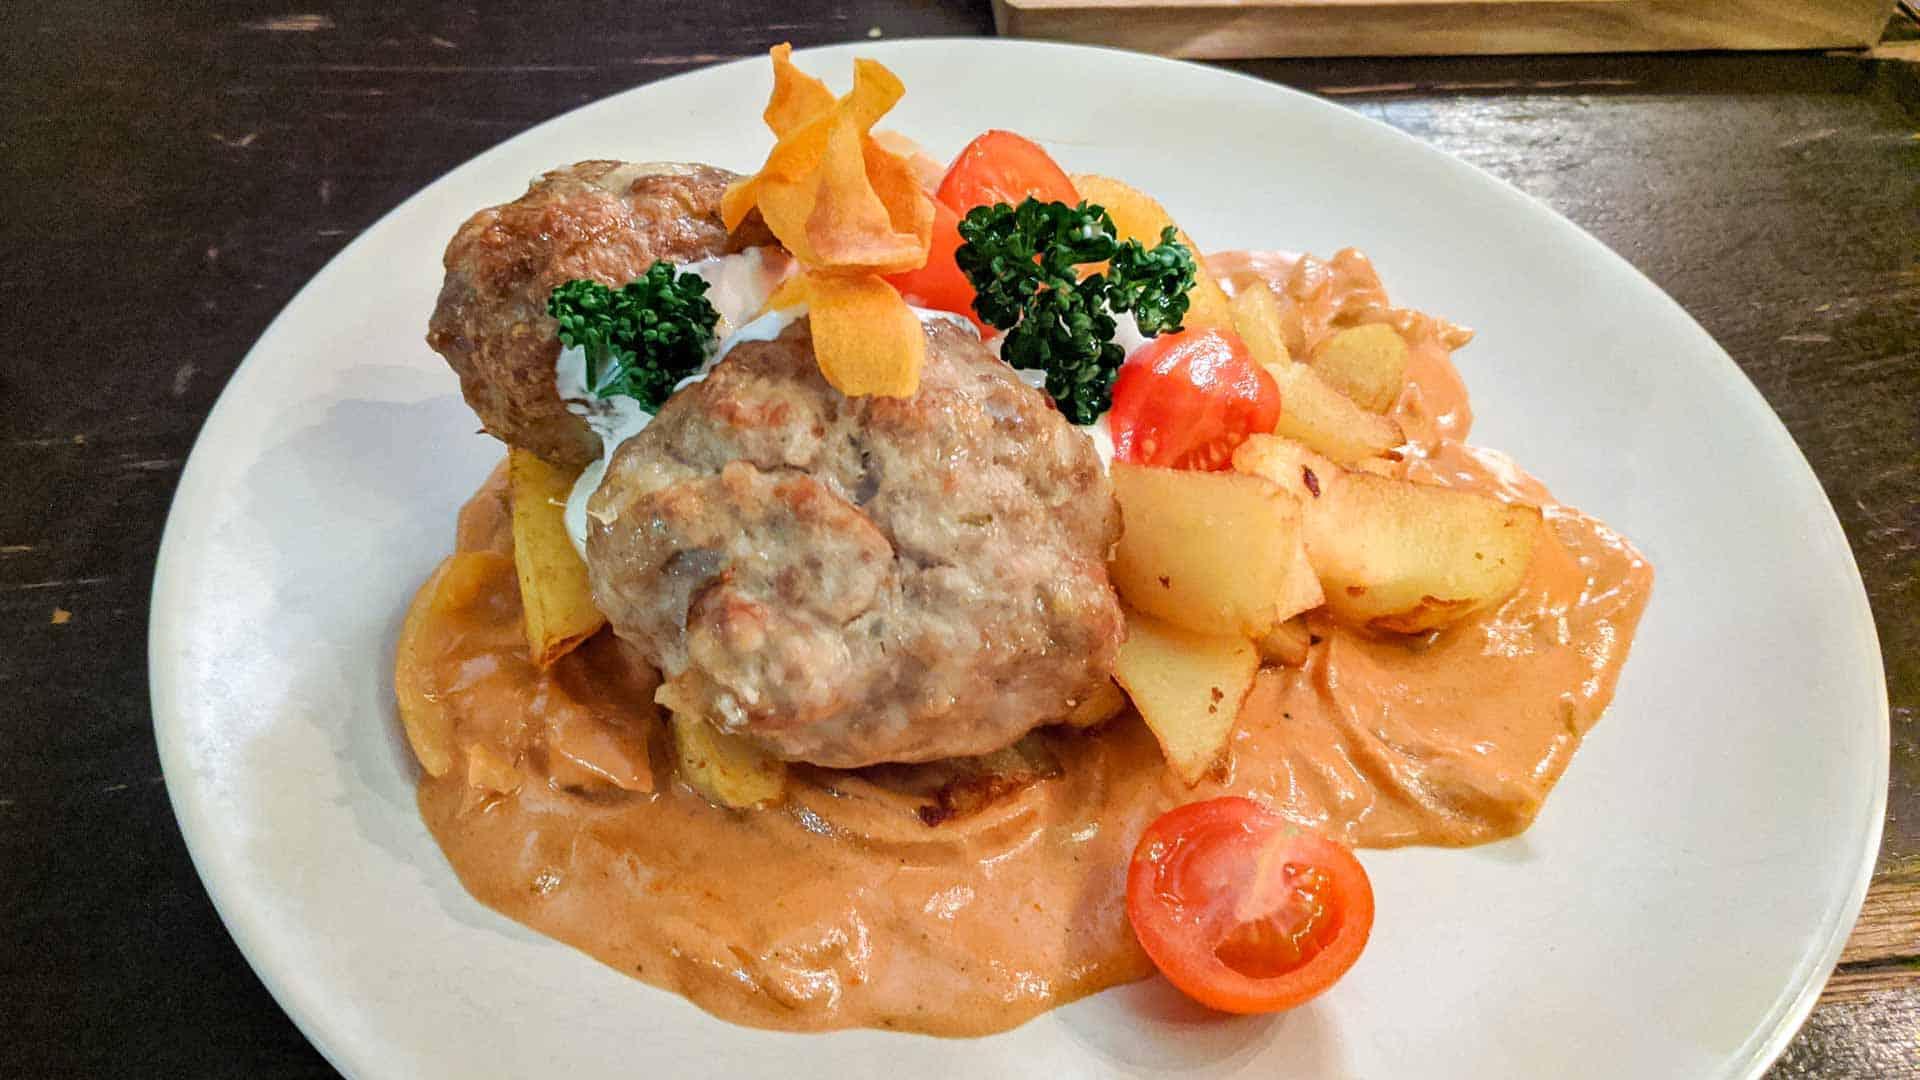 Latvian meatballs with sauce